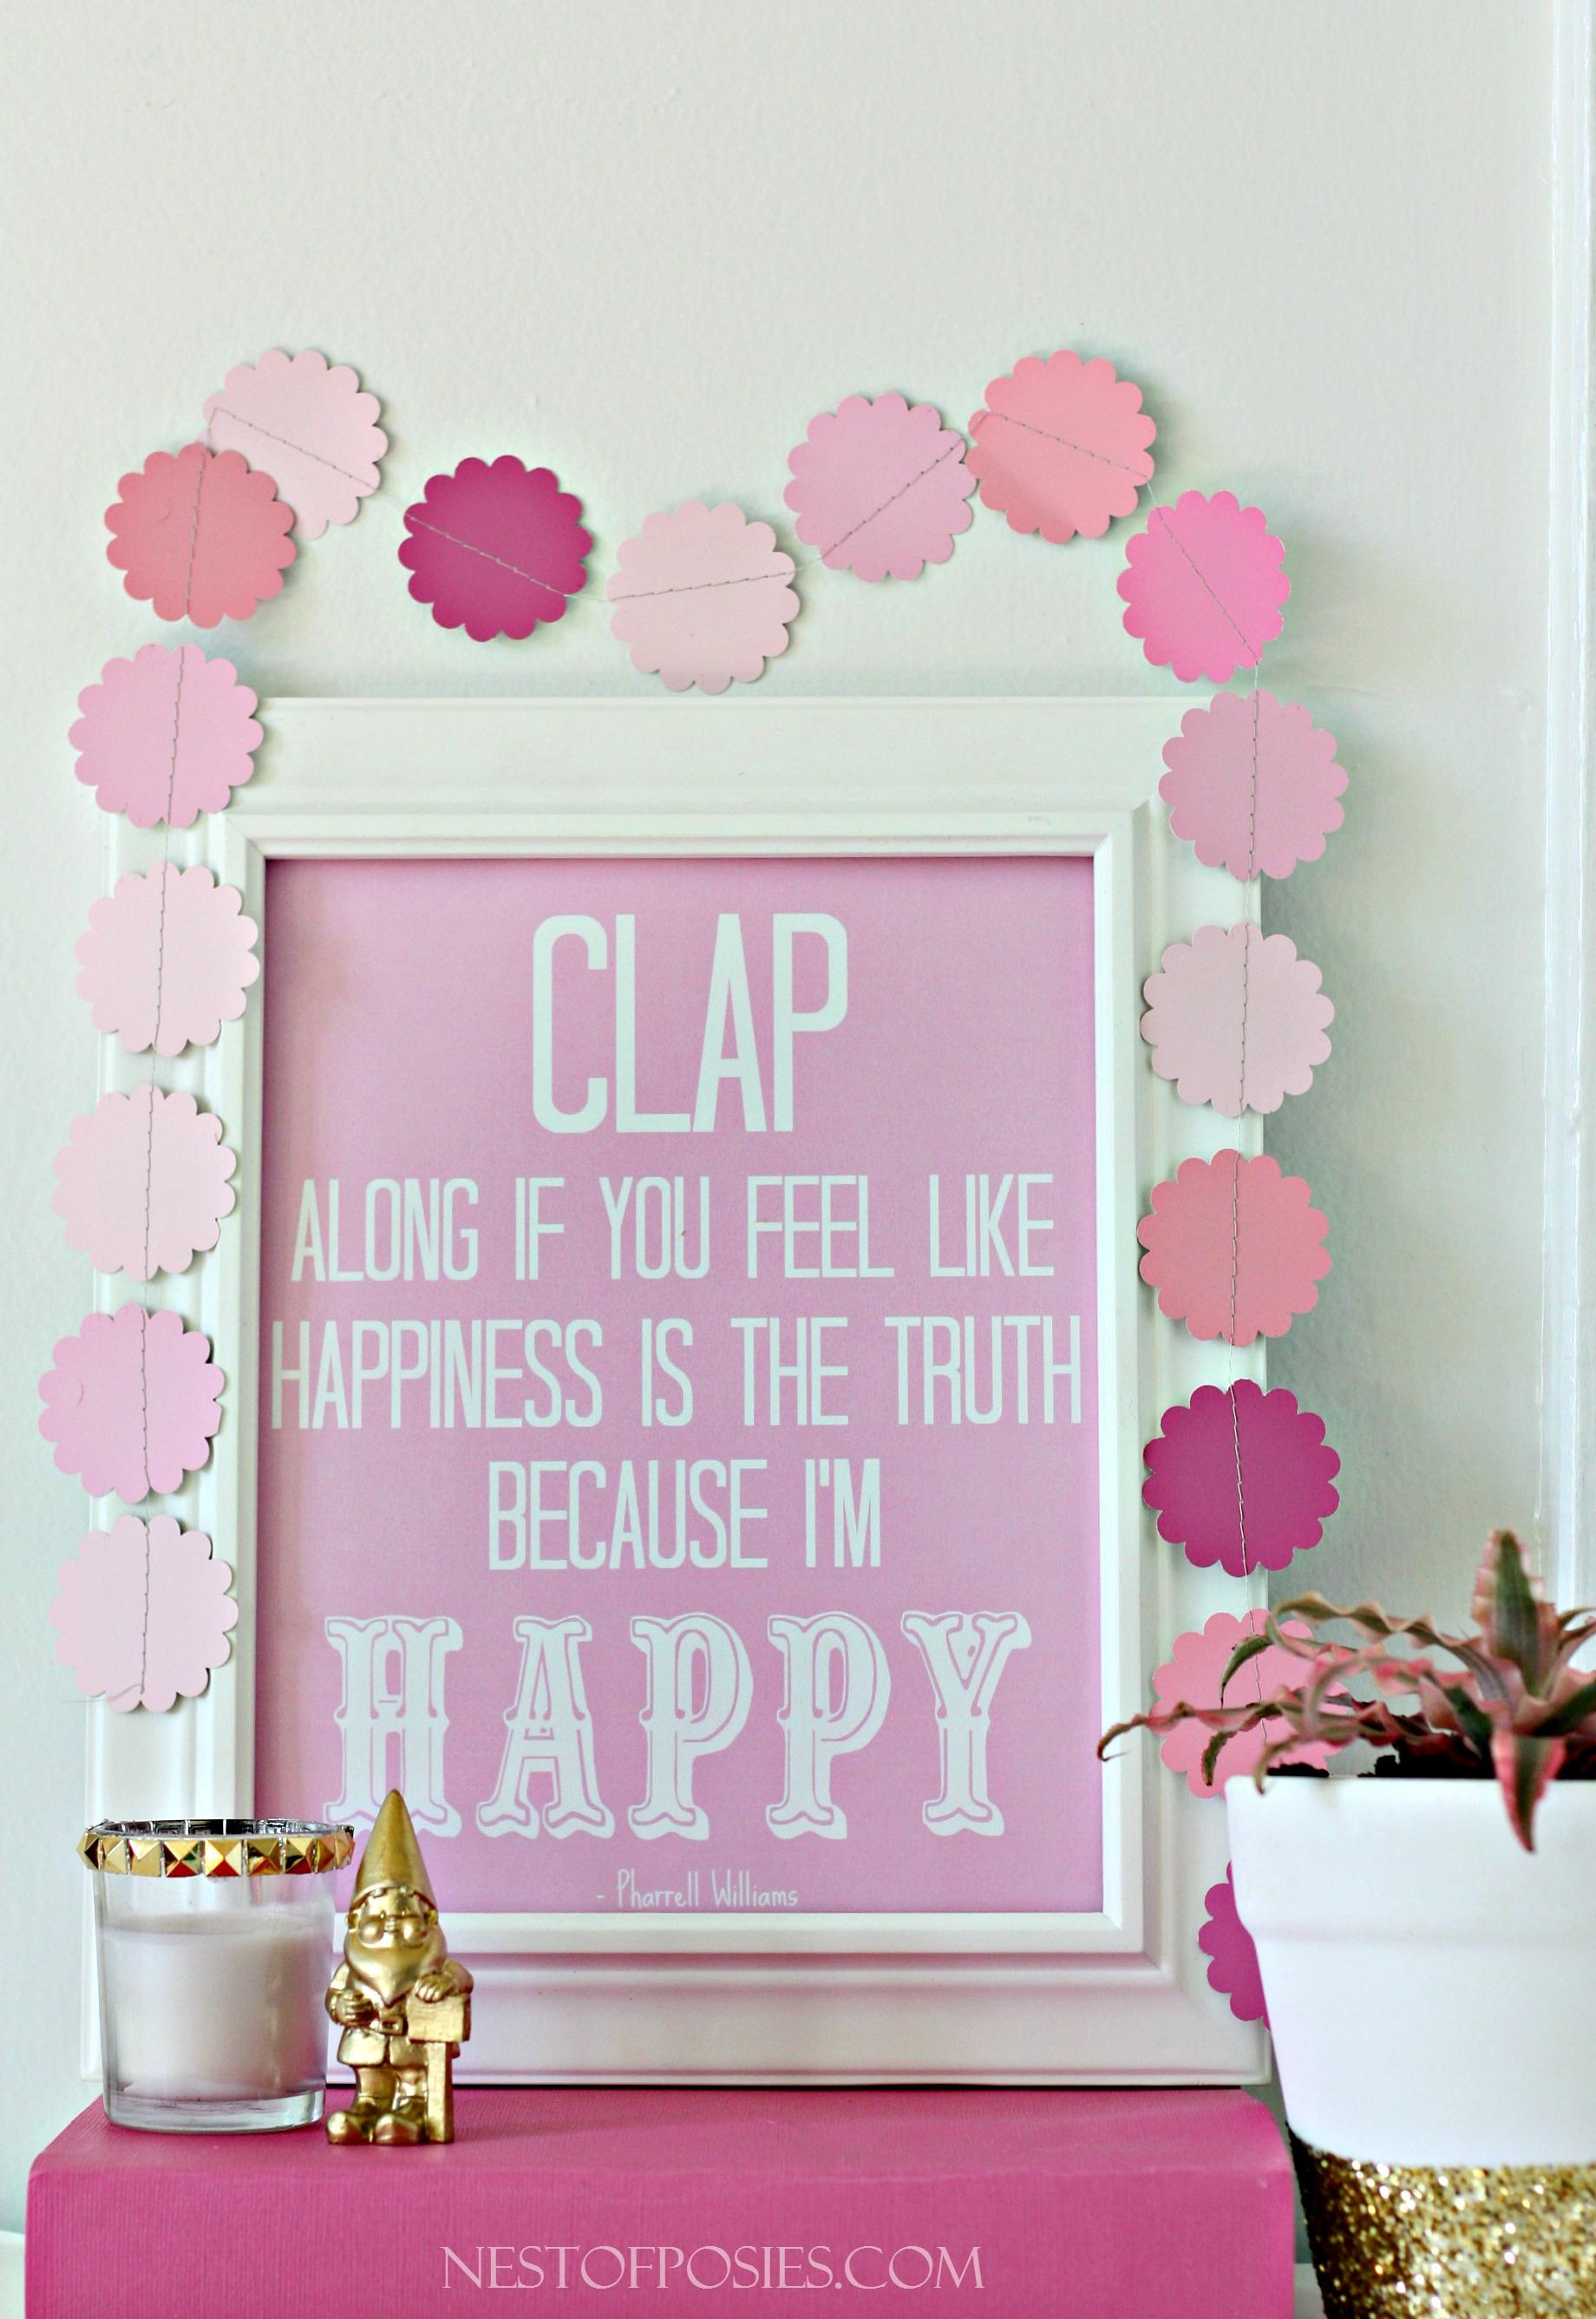 Because I'm Happy Printable